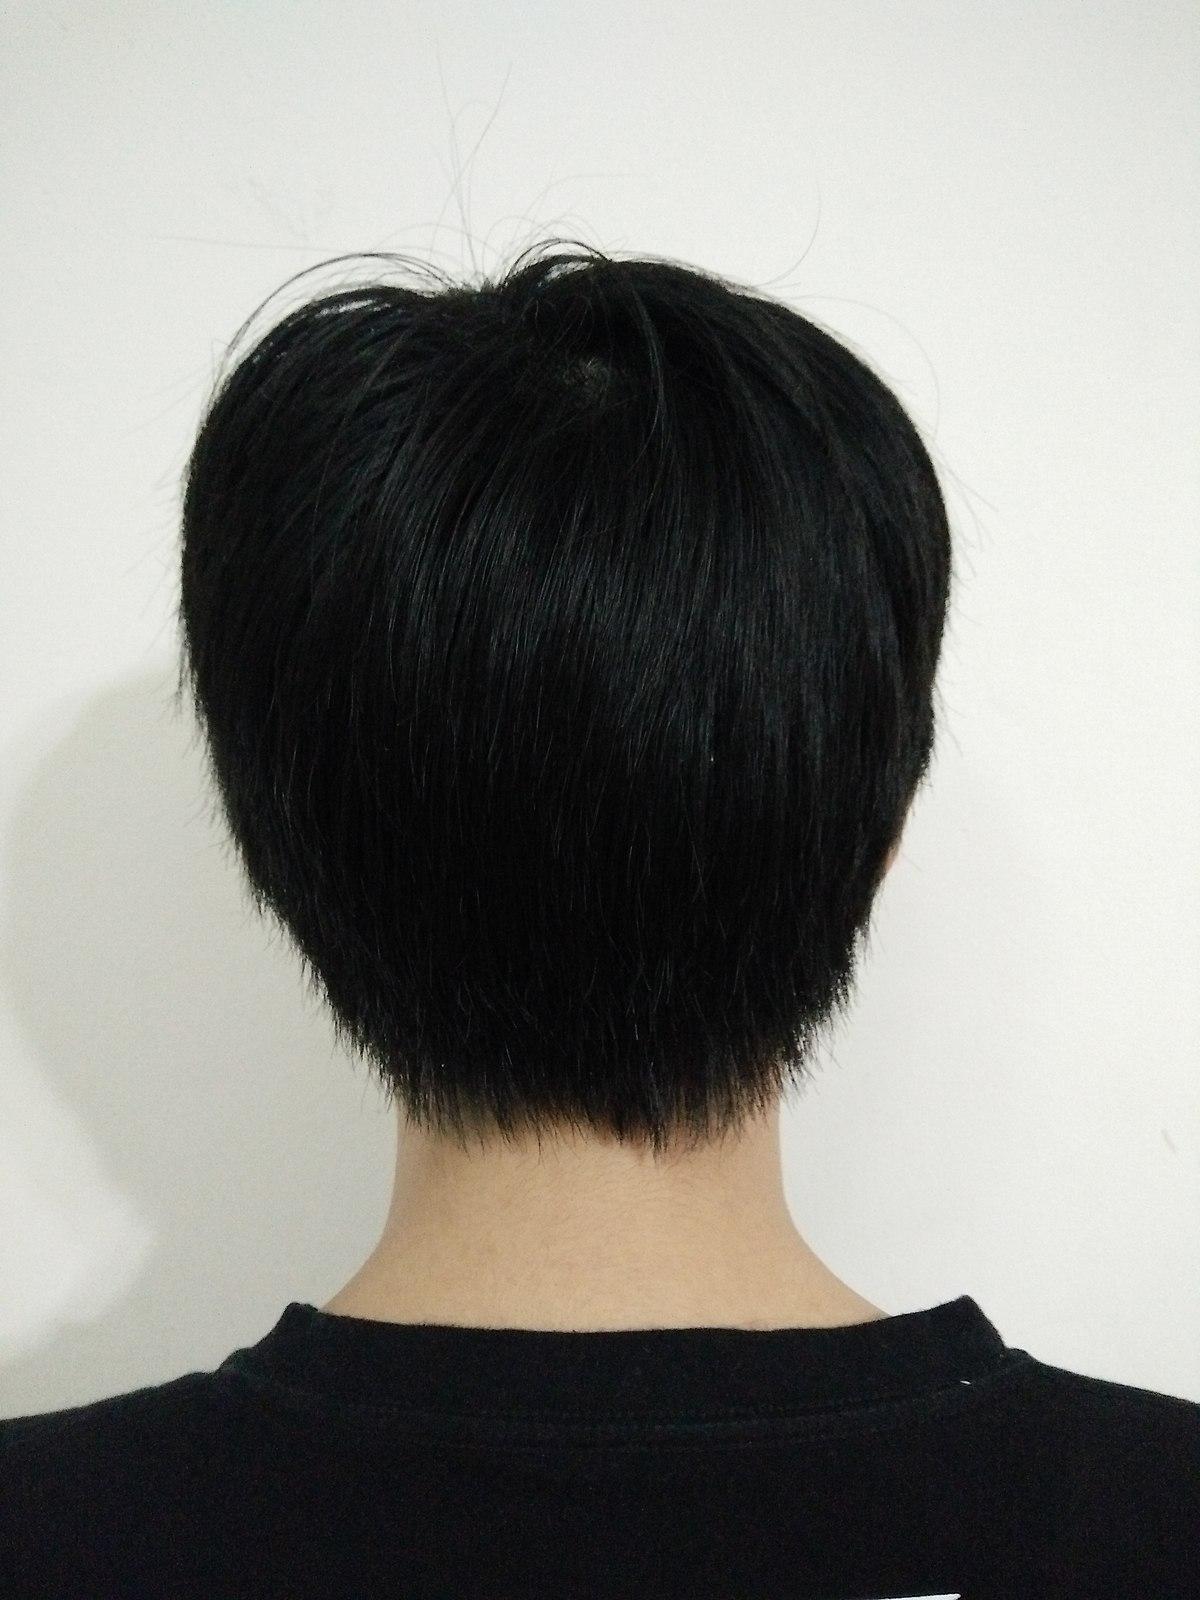 Black Hair Boys : black, File:Boy, Short, Black, Hair,, View.jpg, Wikimedia, Commons